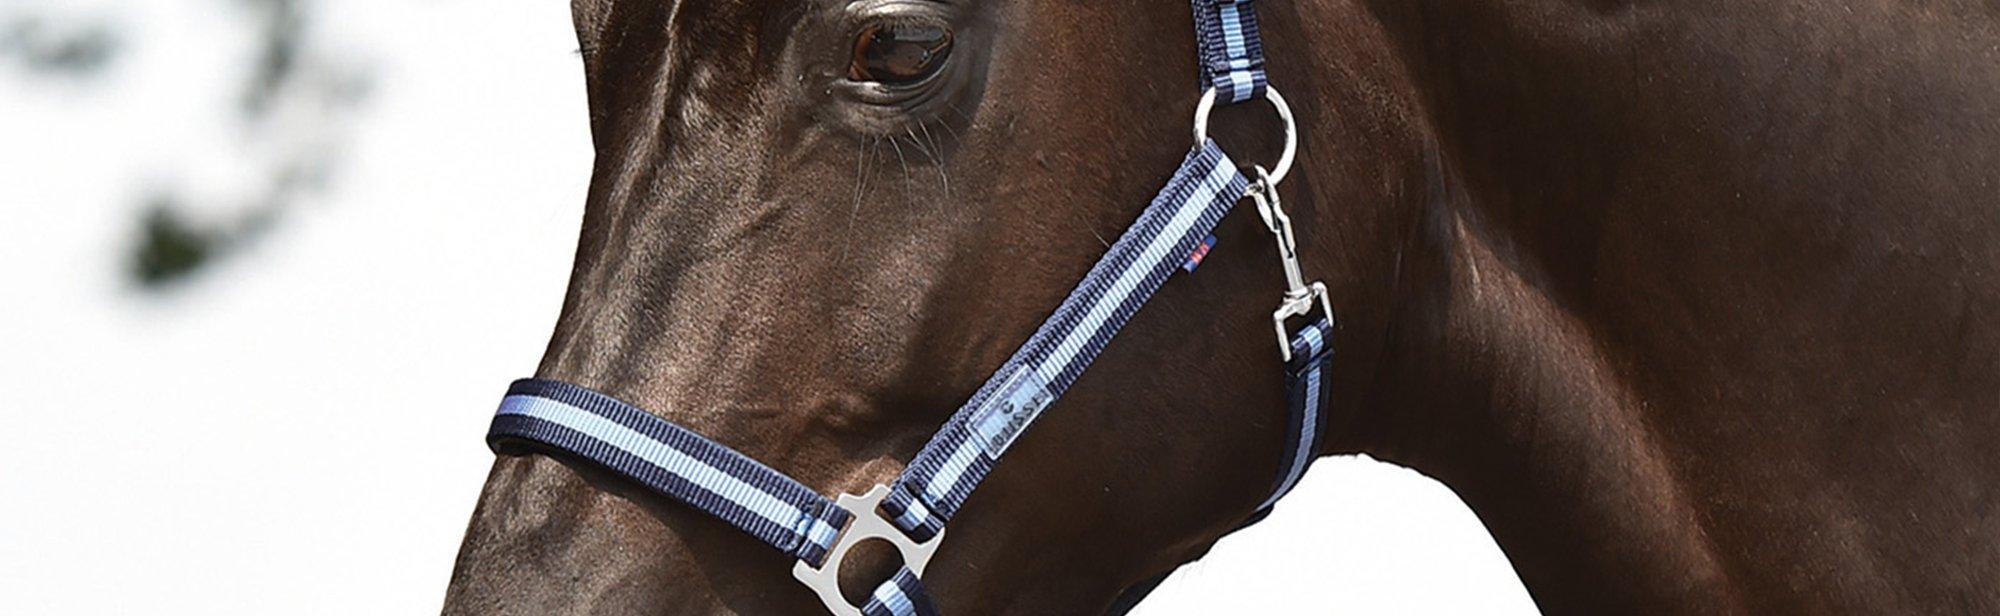 BUSSE Pferdehalfter